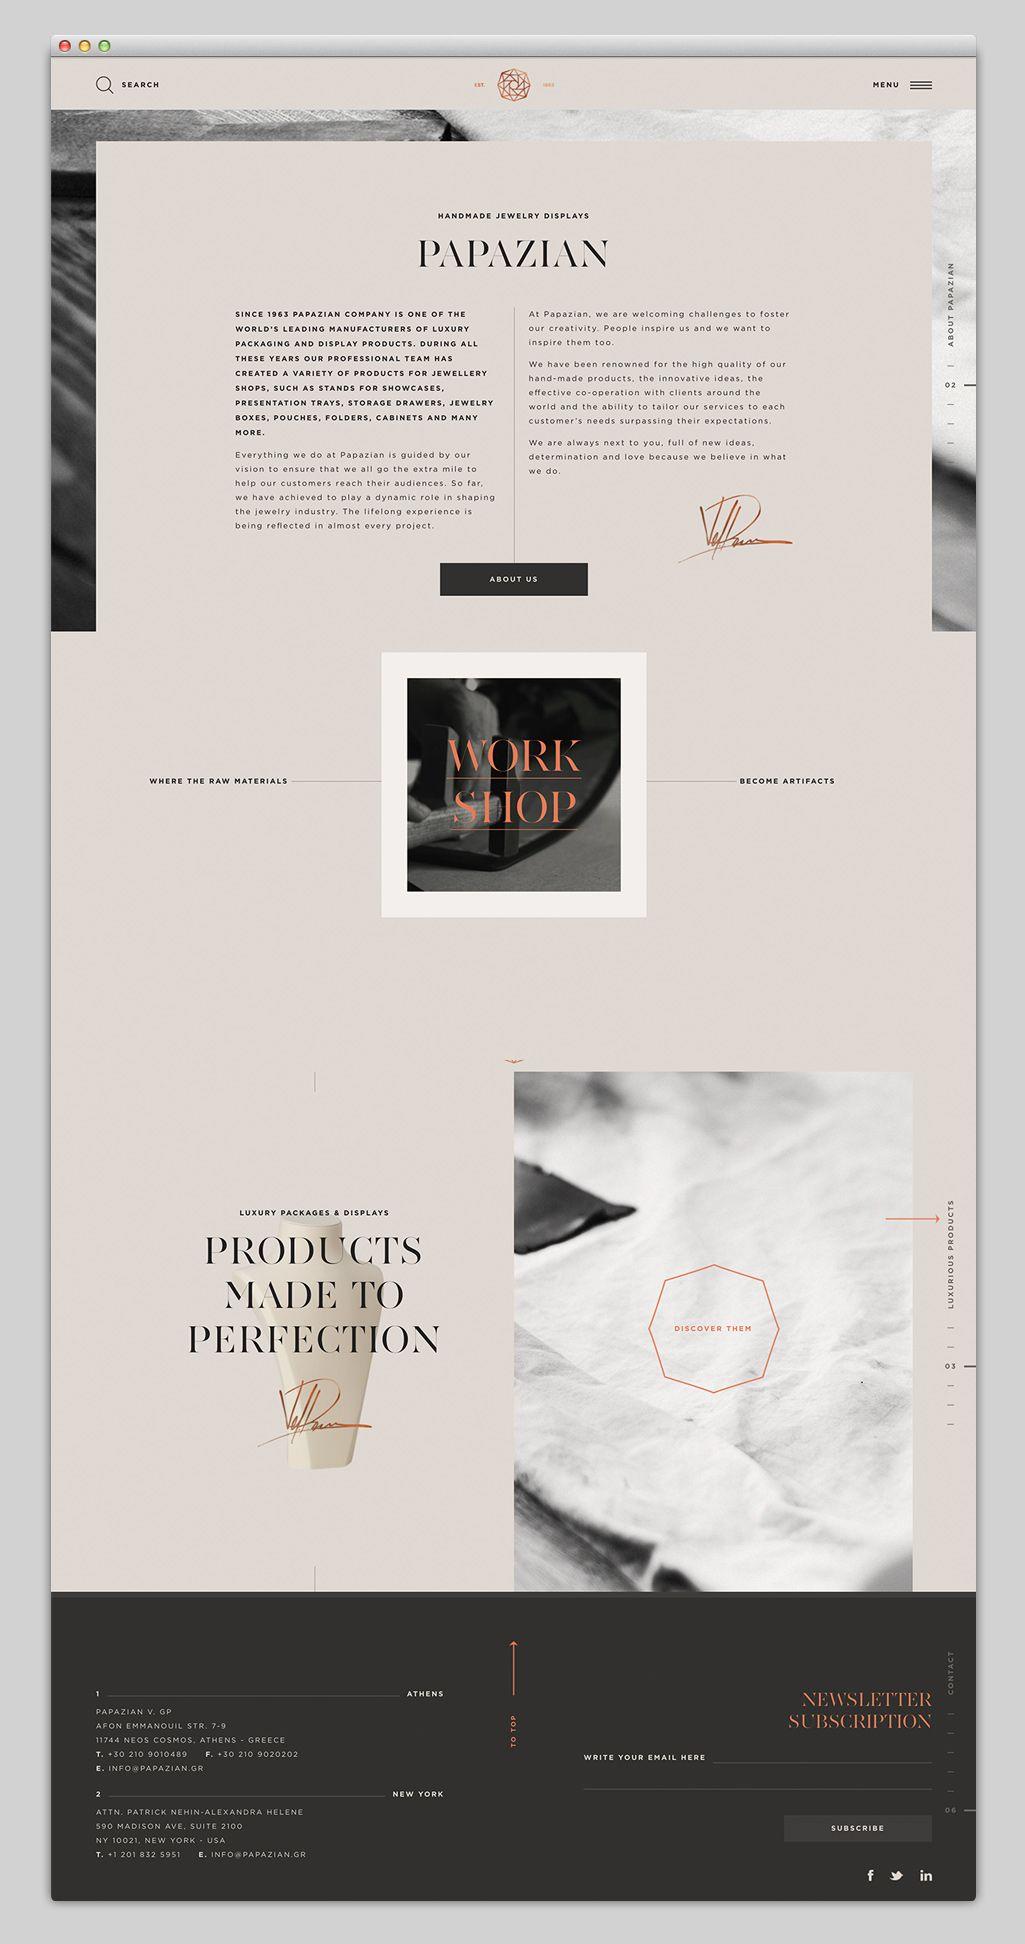 The Web Aesthetic Web Design Quotes Web Design Web Design Tips